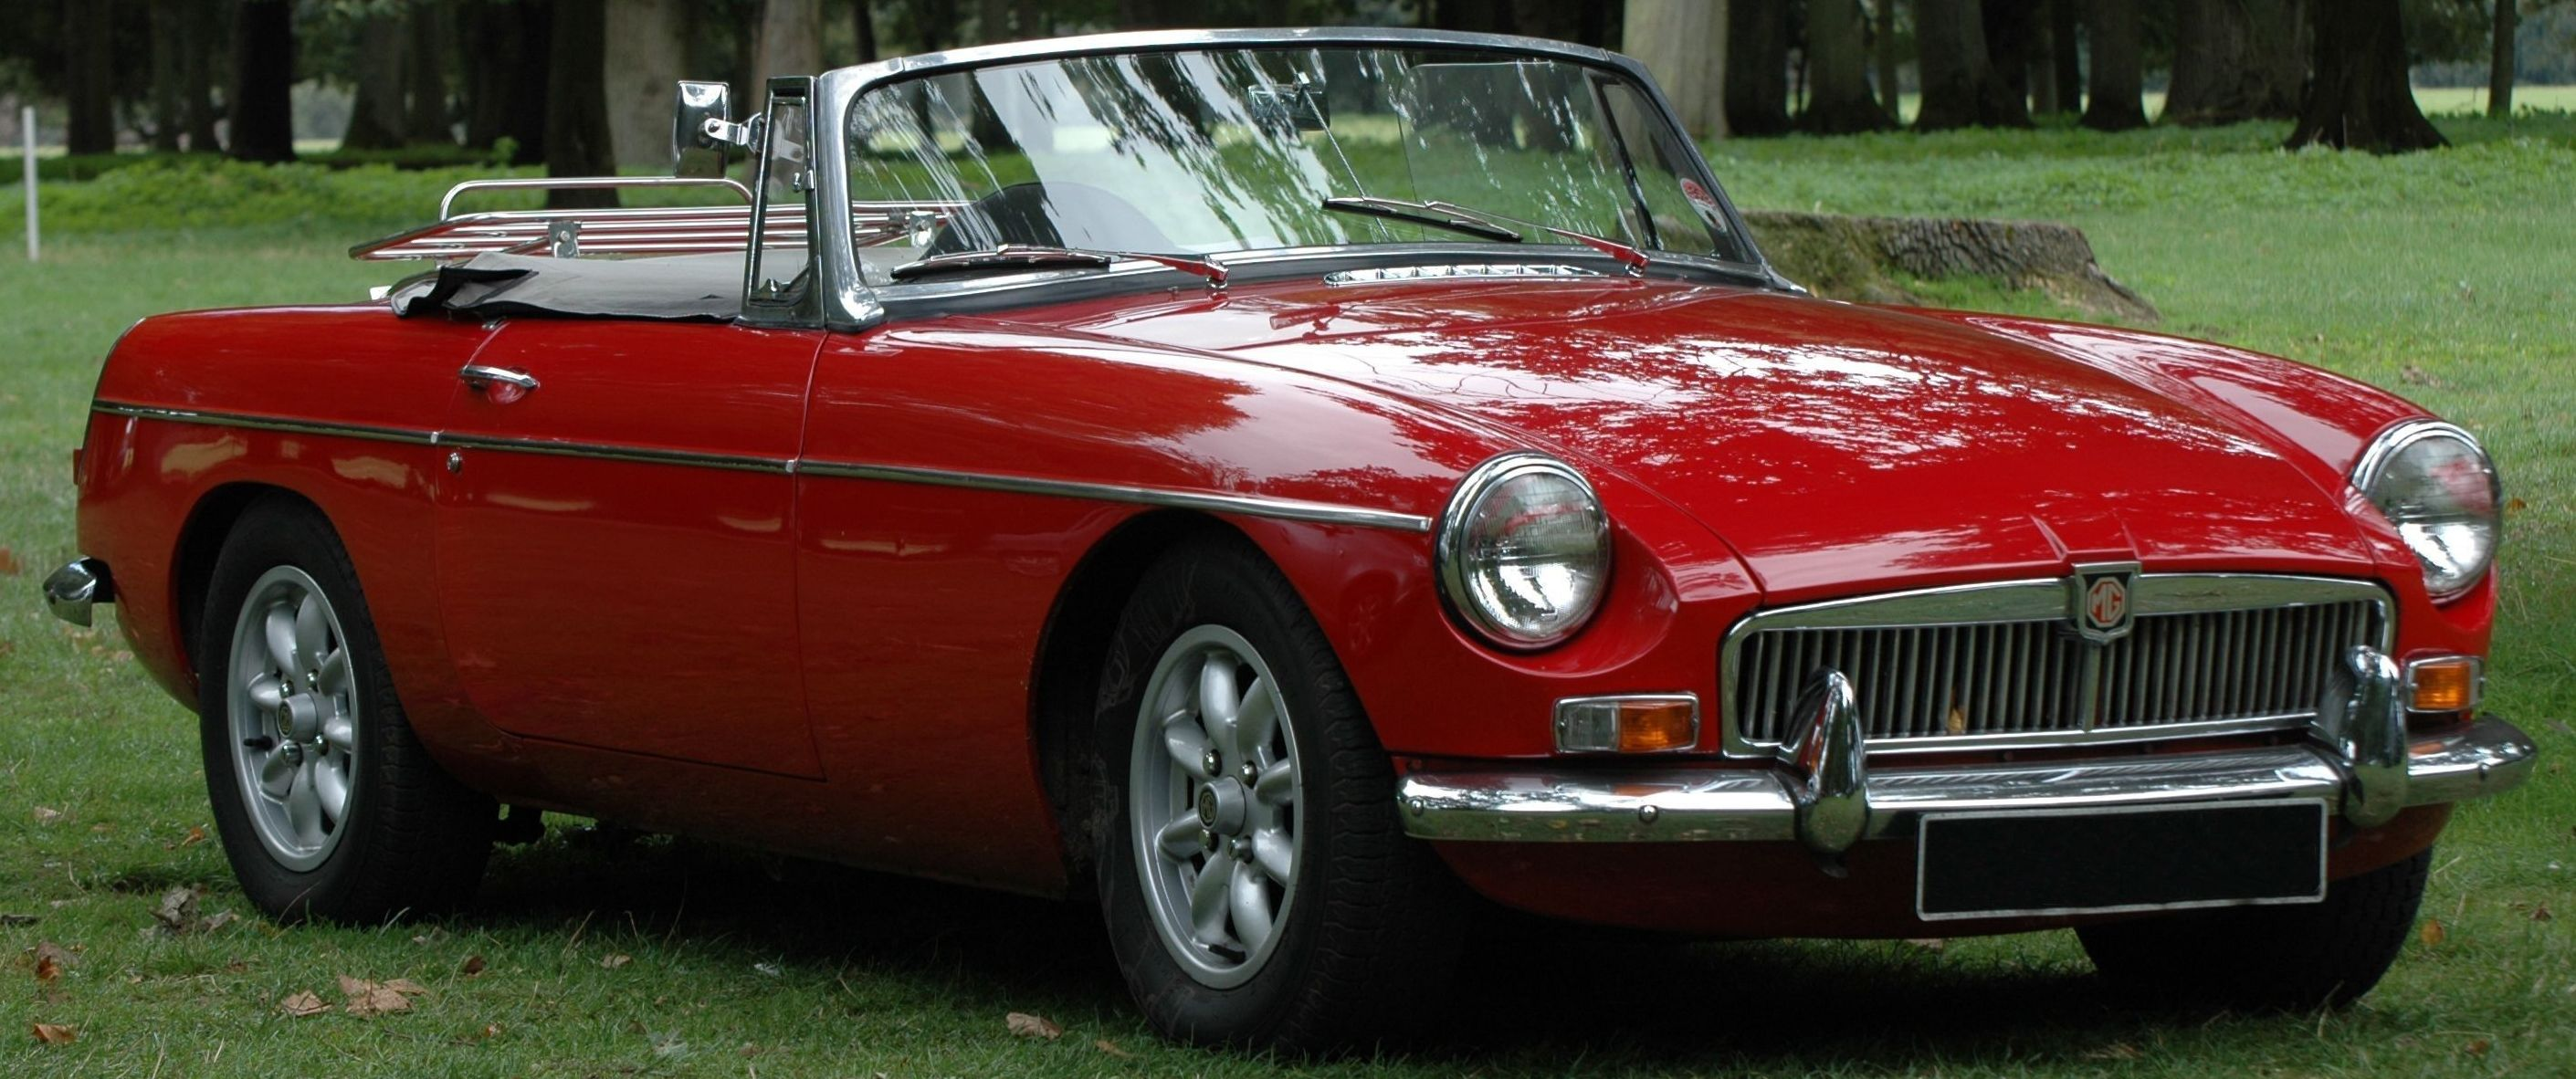 Classic Car Insurance | Principal Insurance